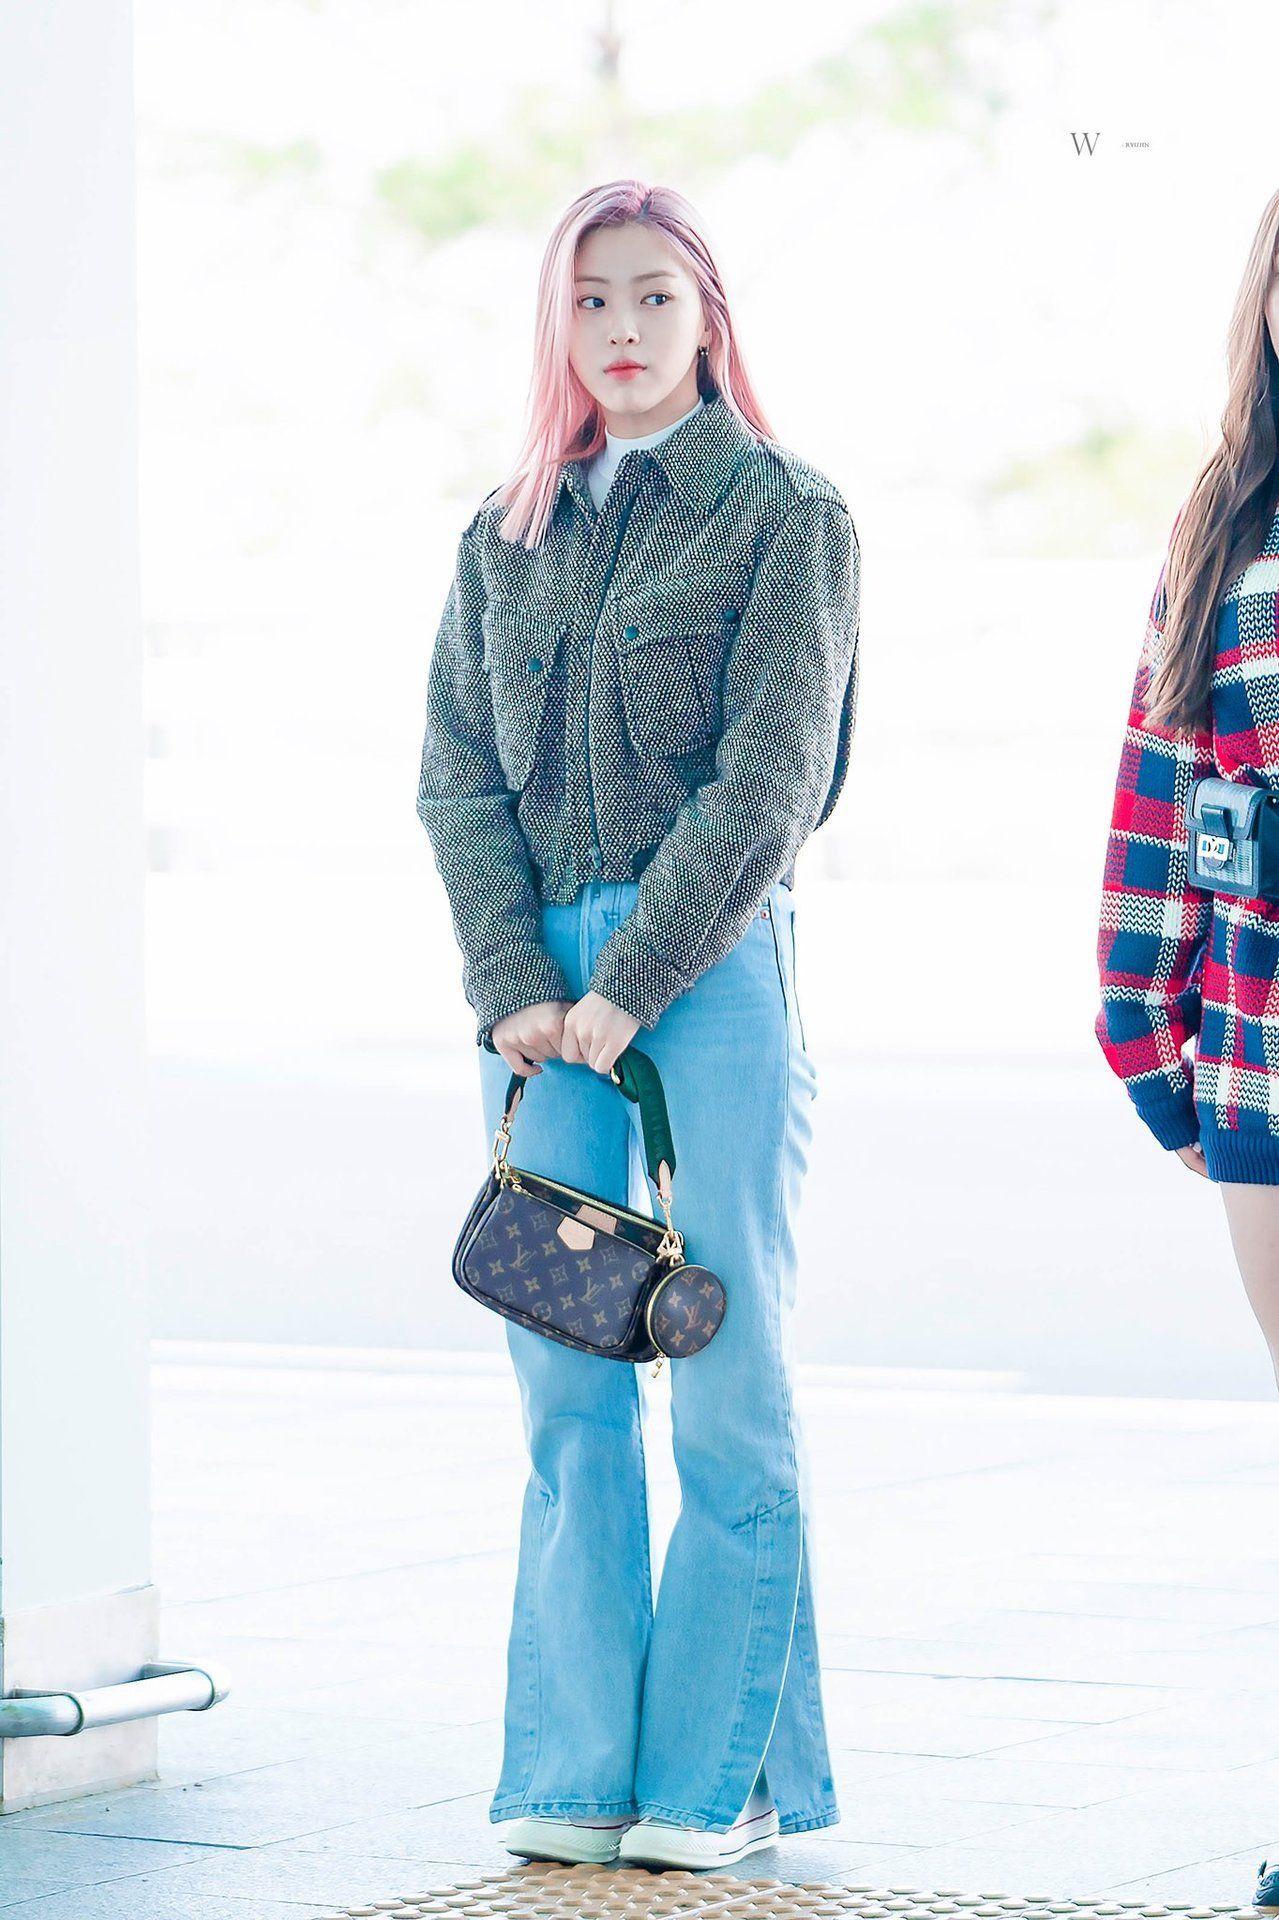 Ryujin Casual Fashion Fashion Girl Fashion